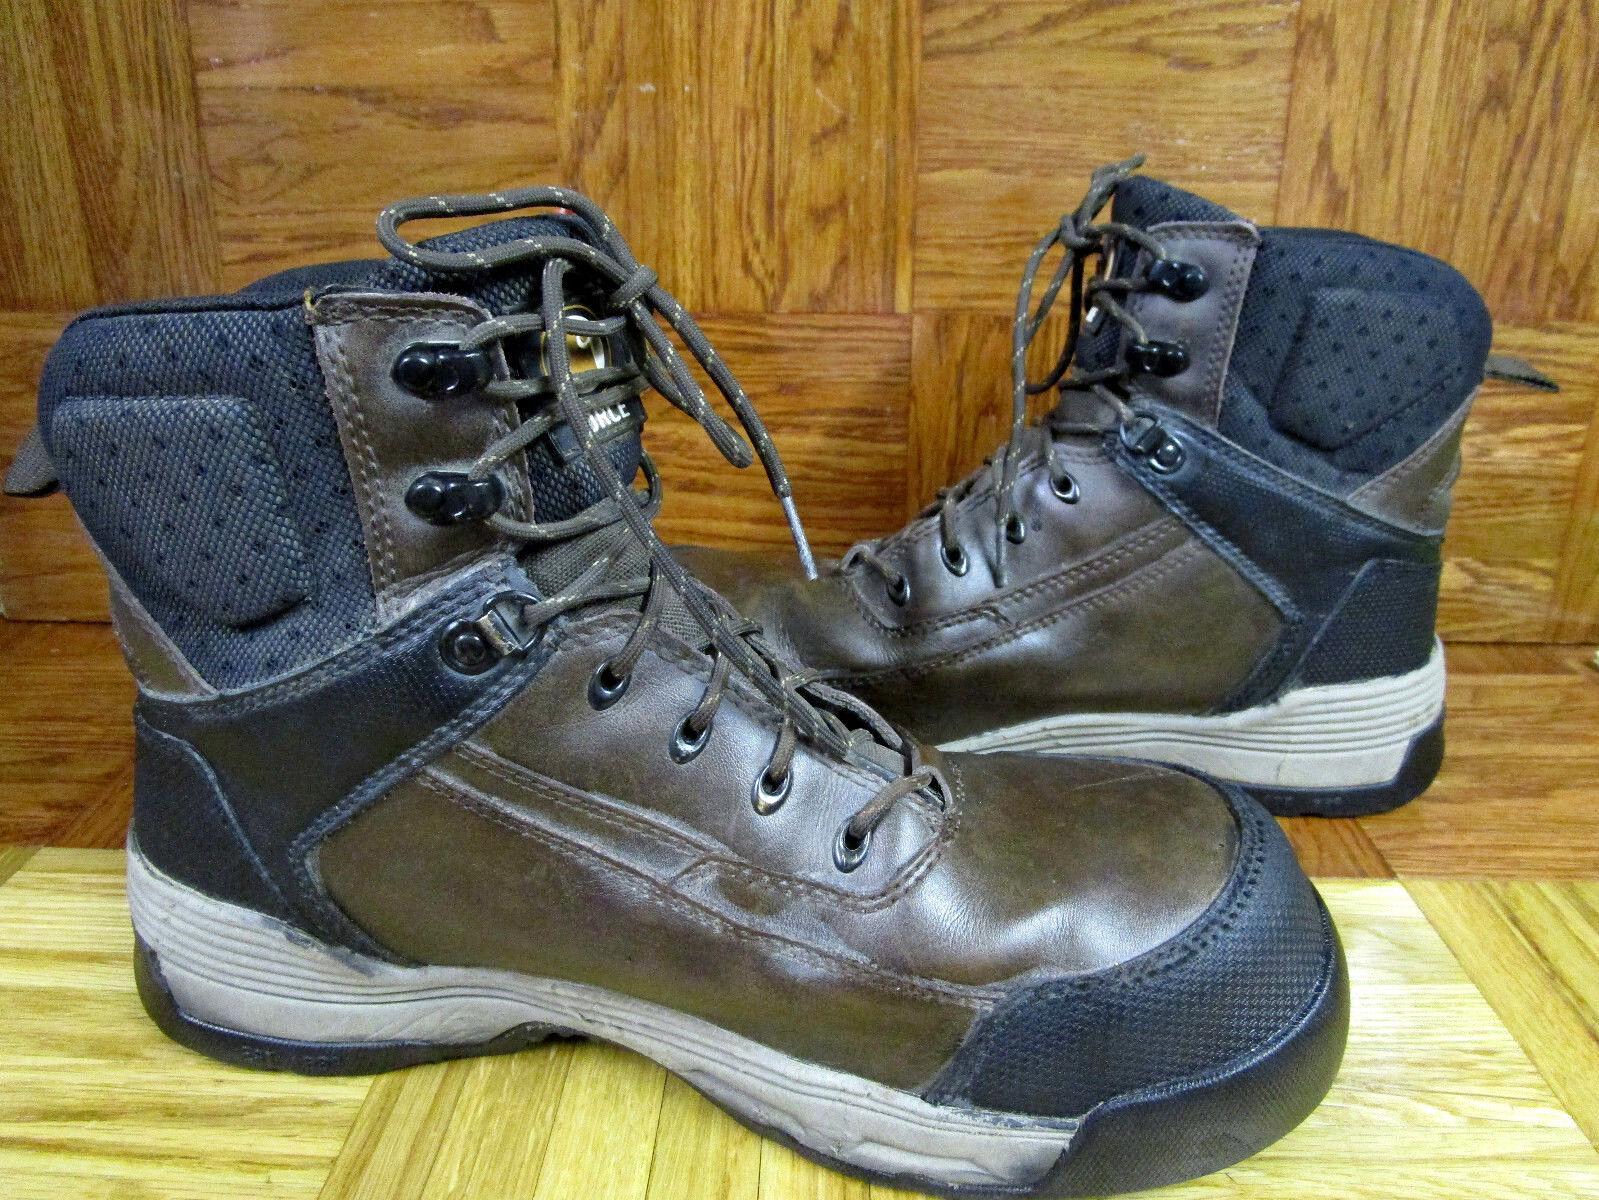 Carhartt Uomo CMA6346 Force Steel Toe Waterproof stivali stivali stivali Dimensione 11 D 3928ae